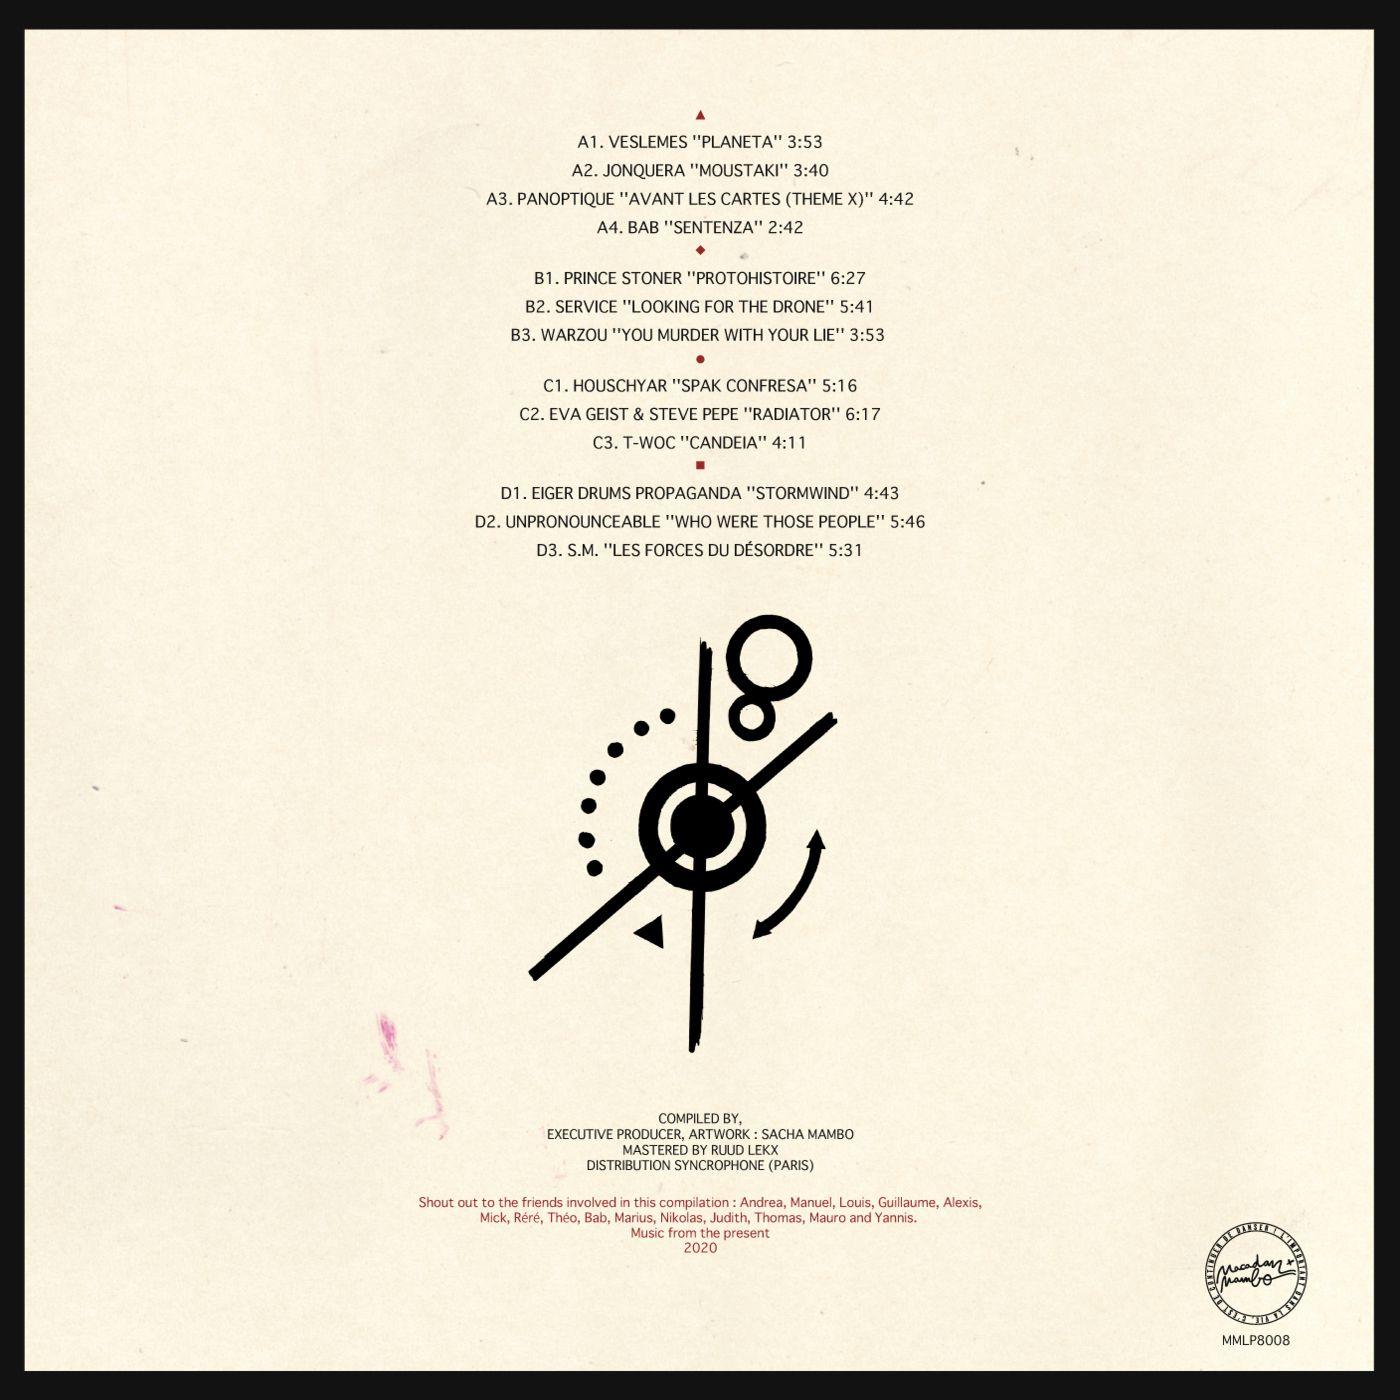 V/A - Danzas Electricas Vol. lll